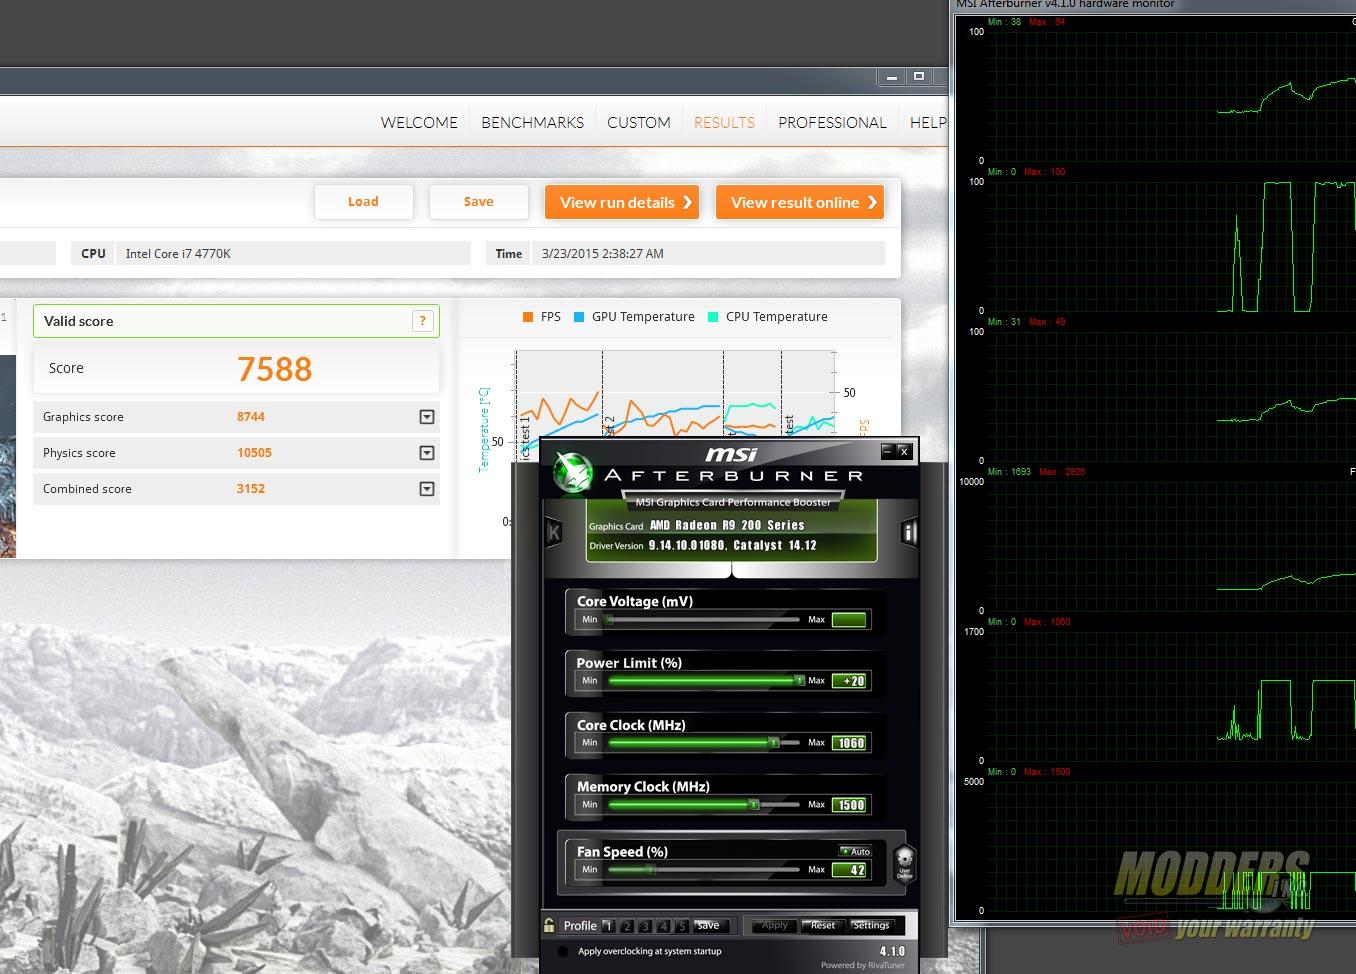 PowerColor R9 285 TurboDuo 1060MHz Core 1500MHz Memory